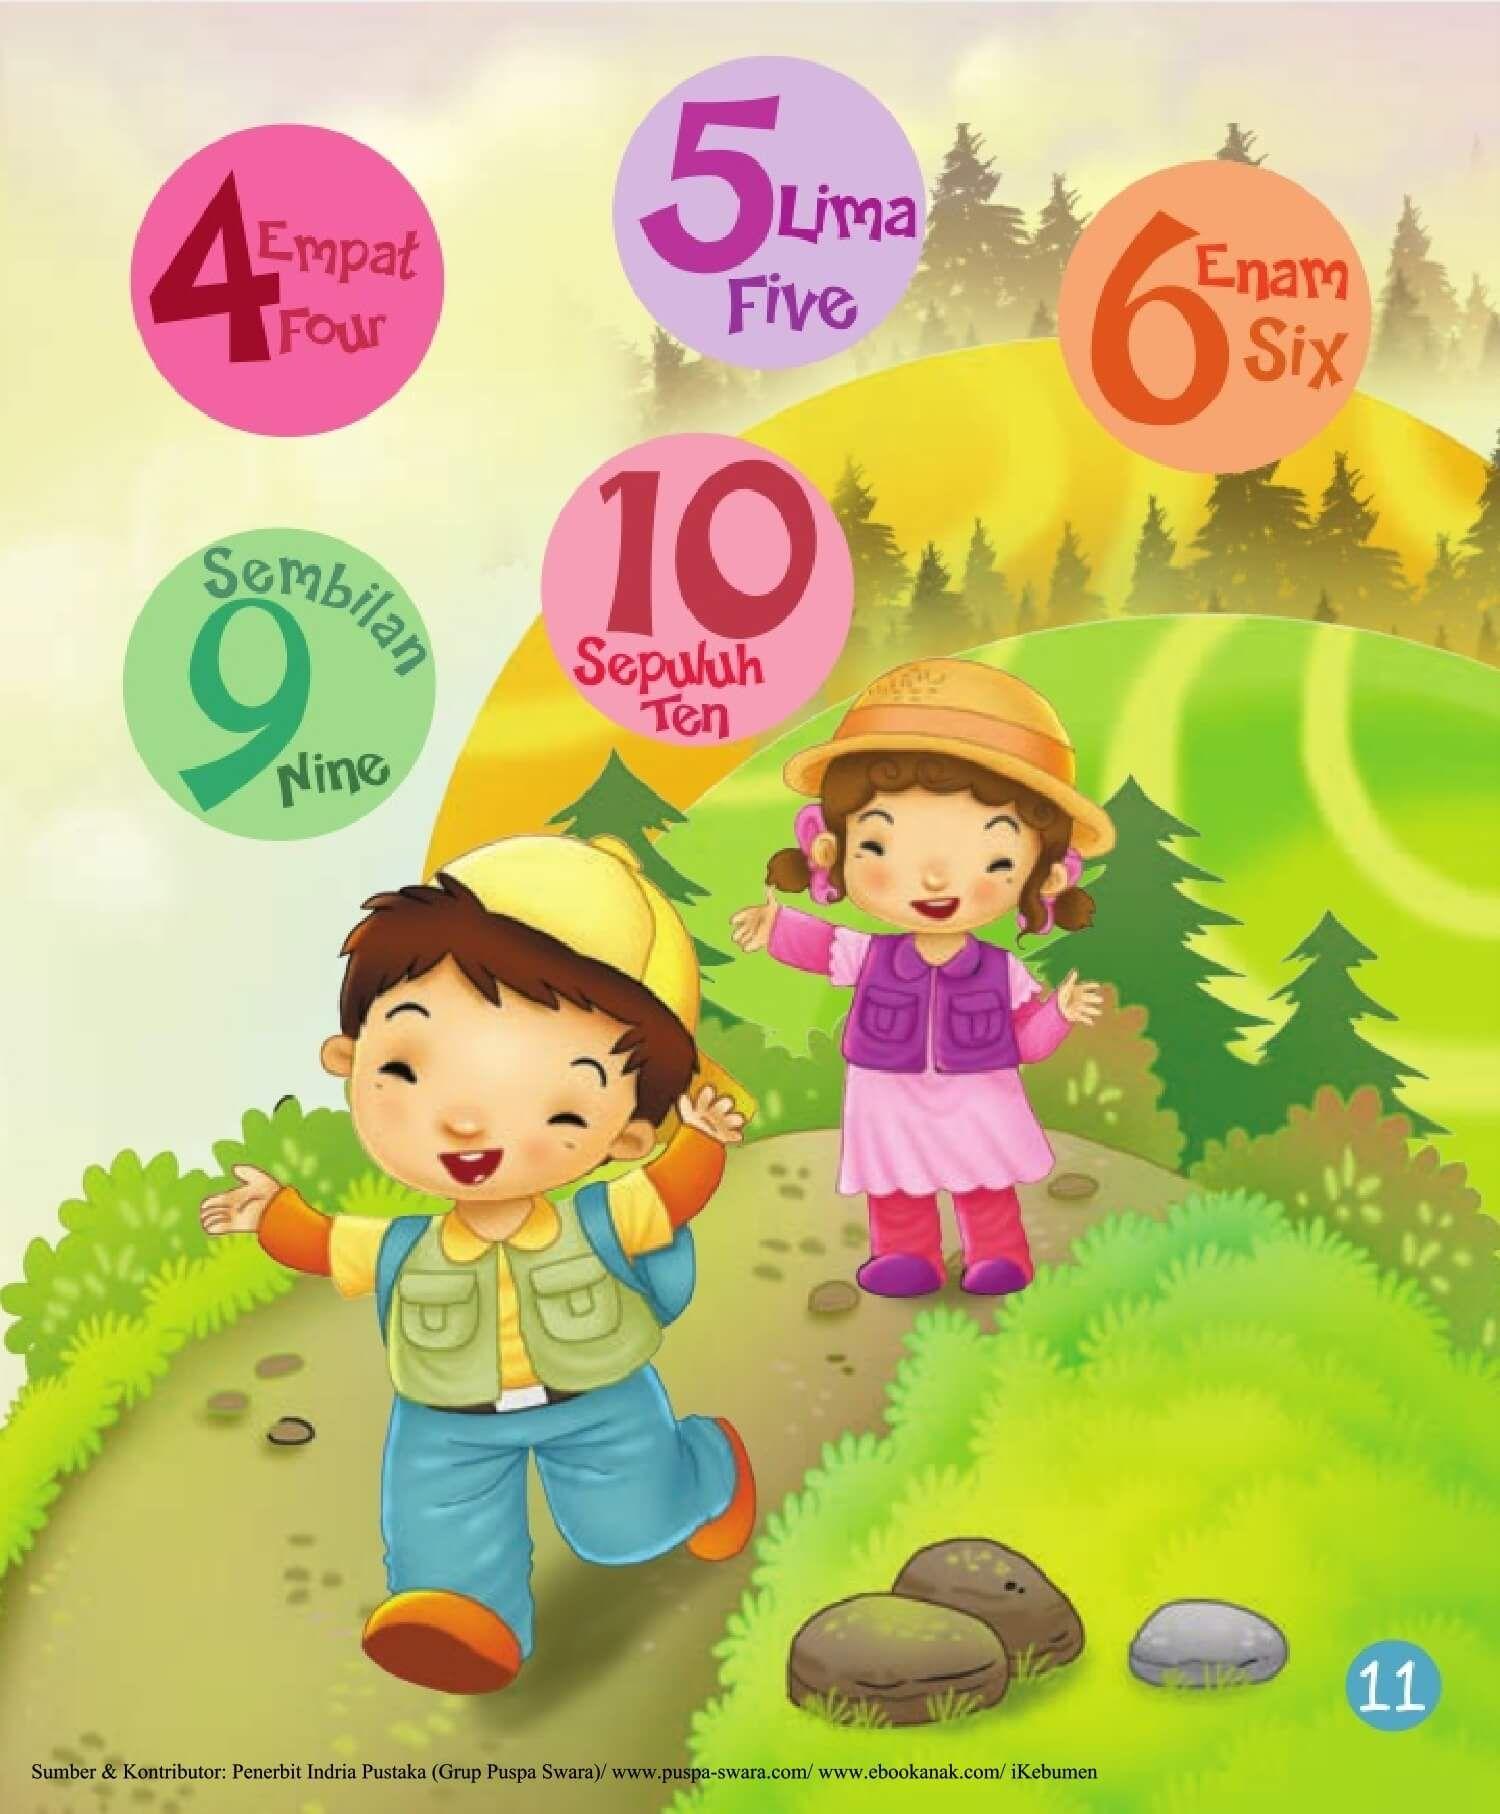 Ebook 2 In 1 Dongeng Dan Aktivitas Bukit Angka Bernyanyi 13 Dongeng Bernyanyi Anak